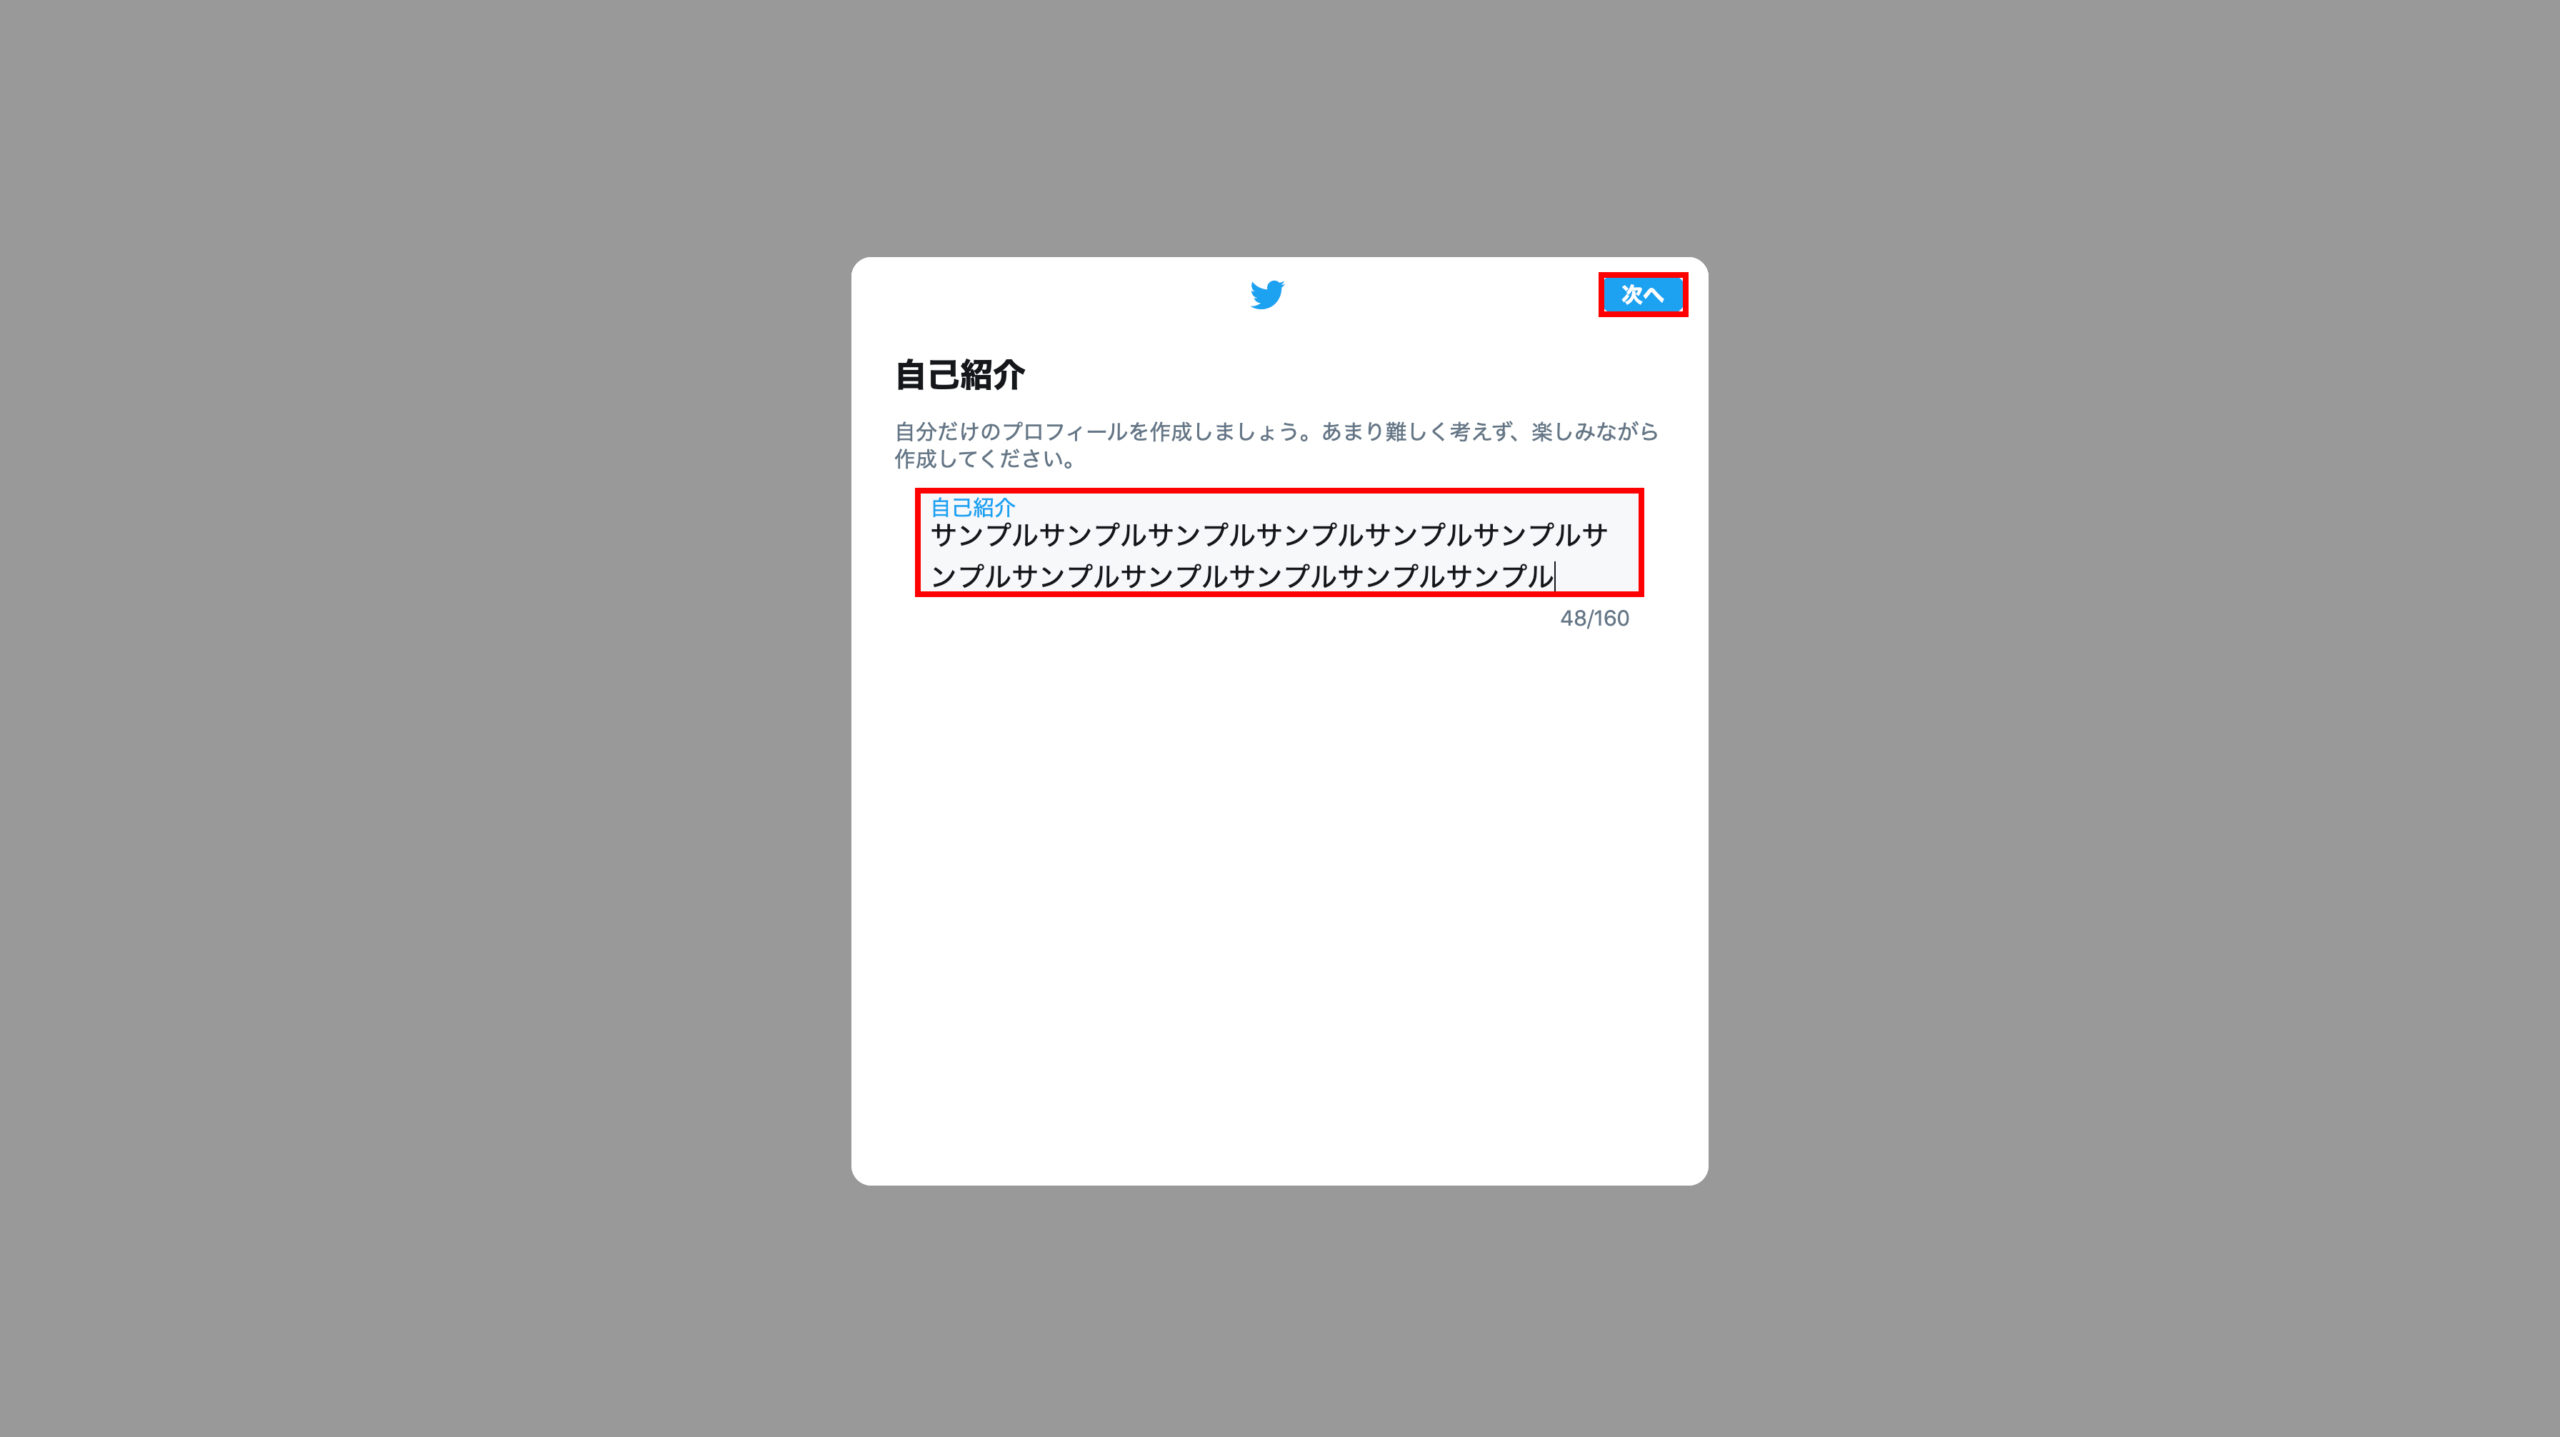 Twitterの自己紹介文の設定